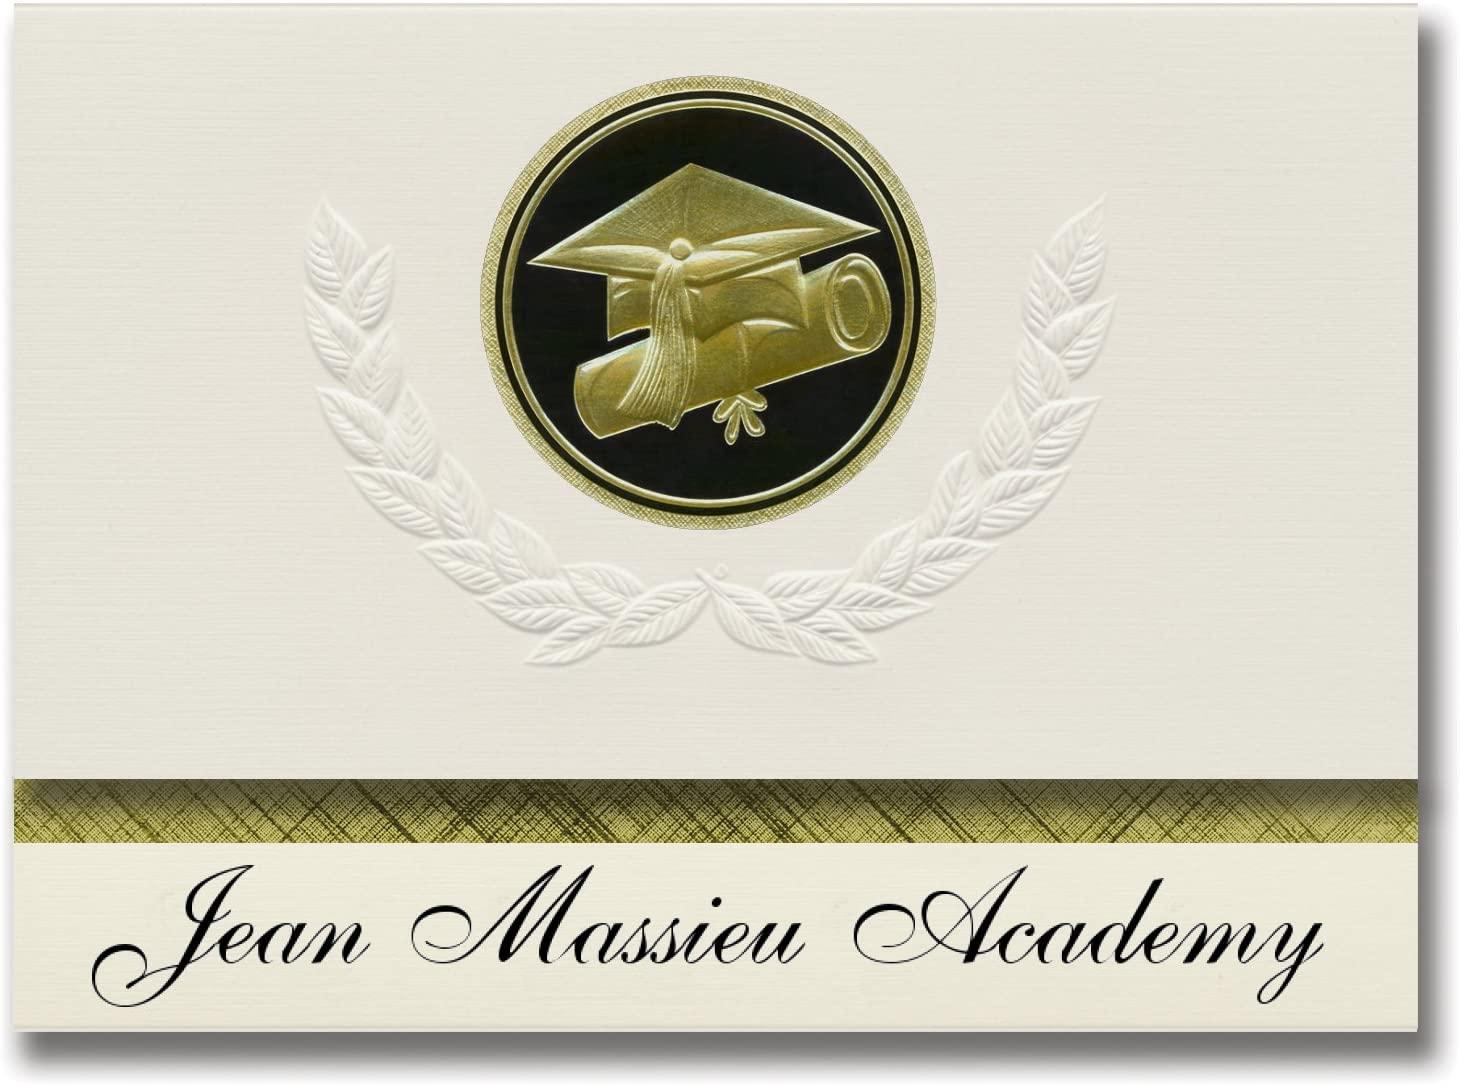 Signature Announcements Jean Massieu Academy (Arlington, TX) Graduation Announcements, Presidential style, Elite package of 25 Cap & Diploma Seal Black & Gold